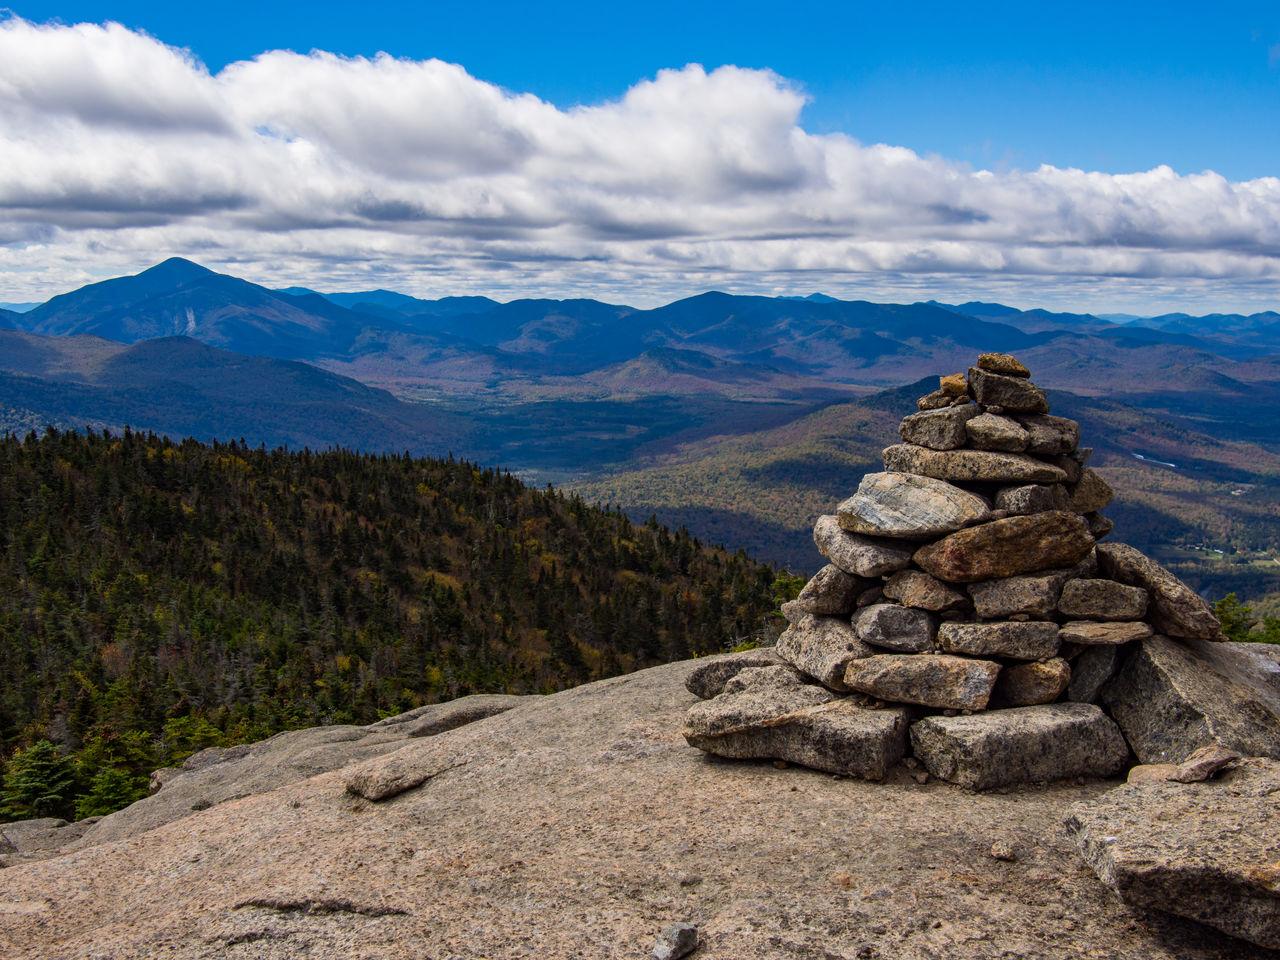 STACK OF ROCKS AGAINST MOUNTAIN RANGE